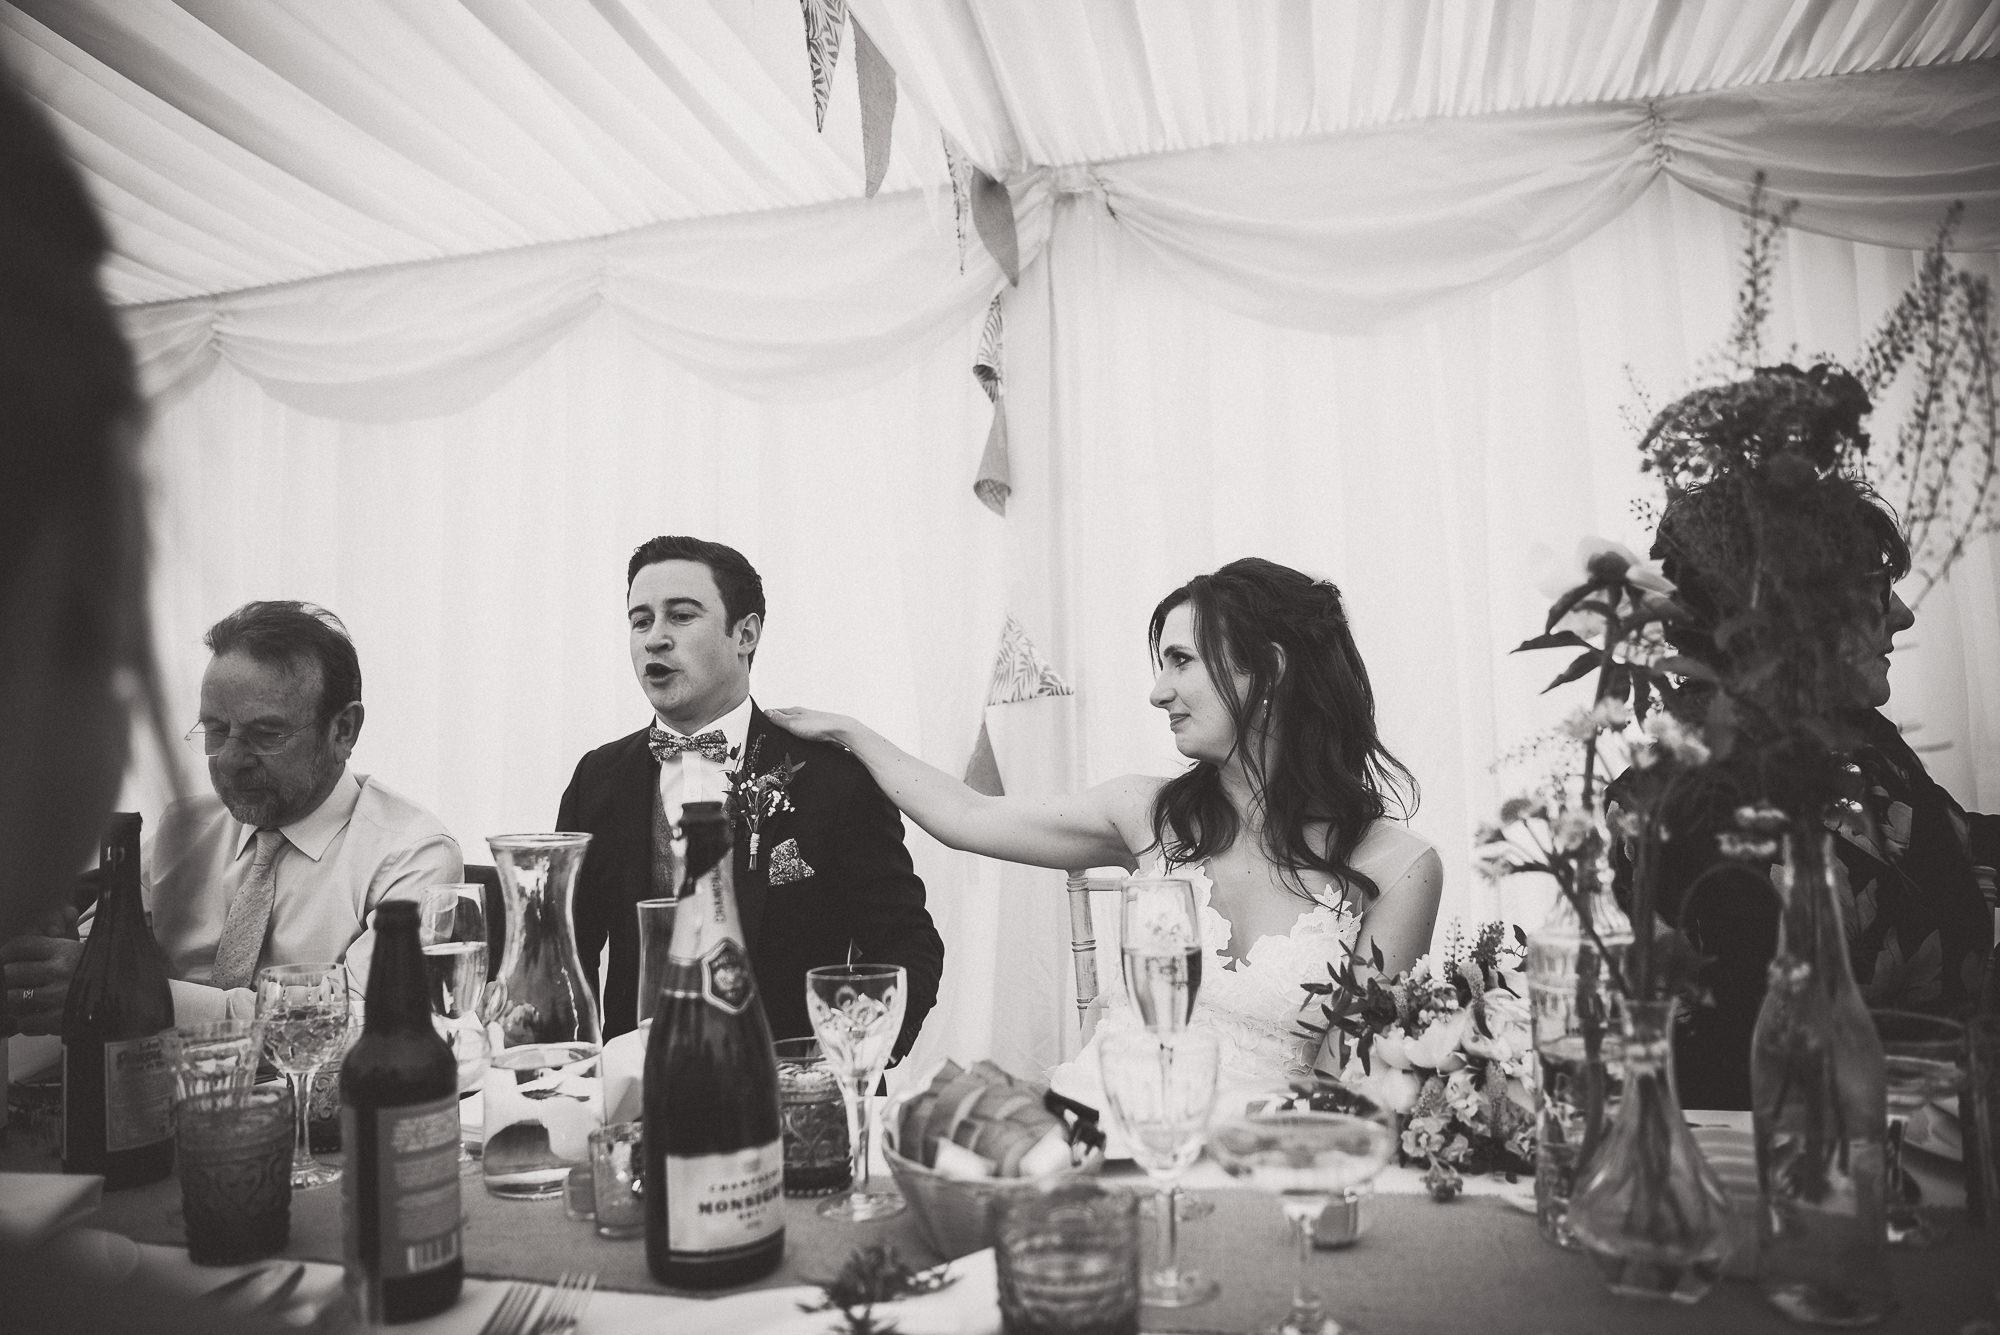 Veils & Bales Wedding Photography | Charlie & Steve SCSS 192